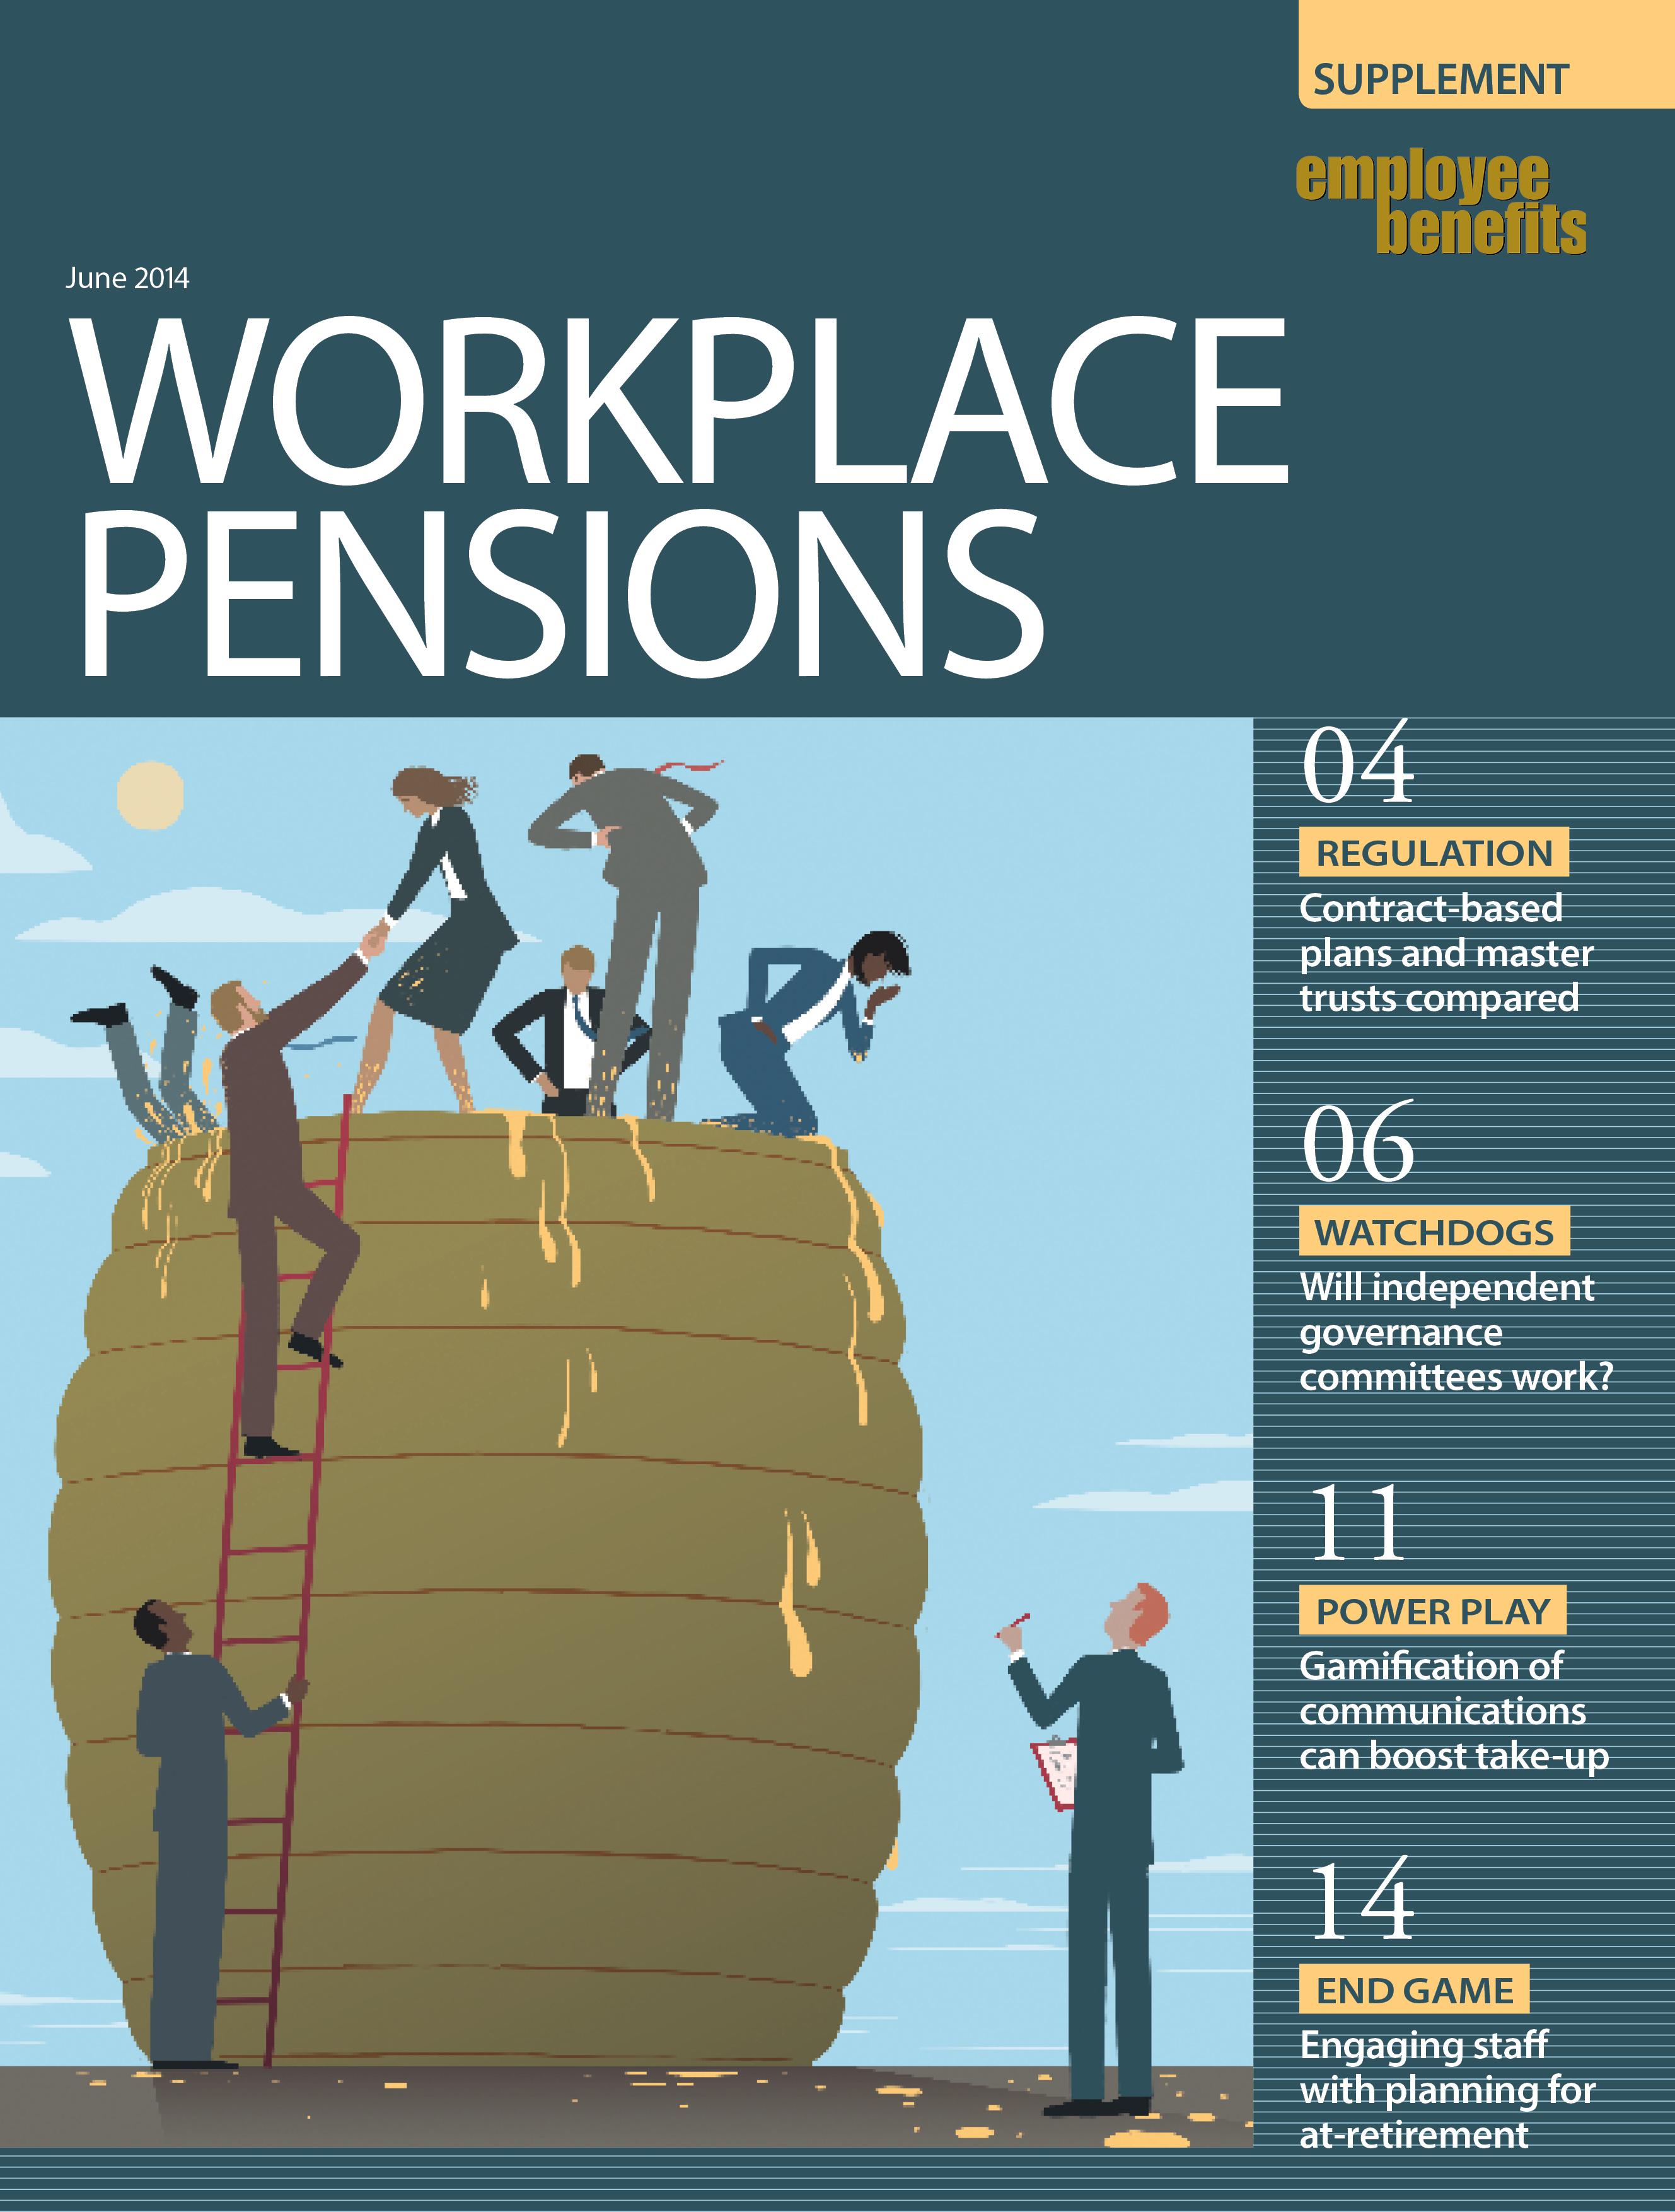 PensionsReport-June2014.jpg